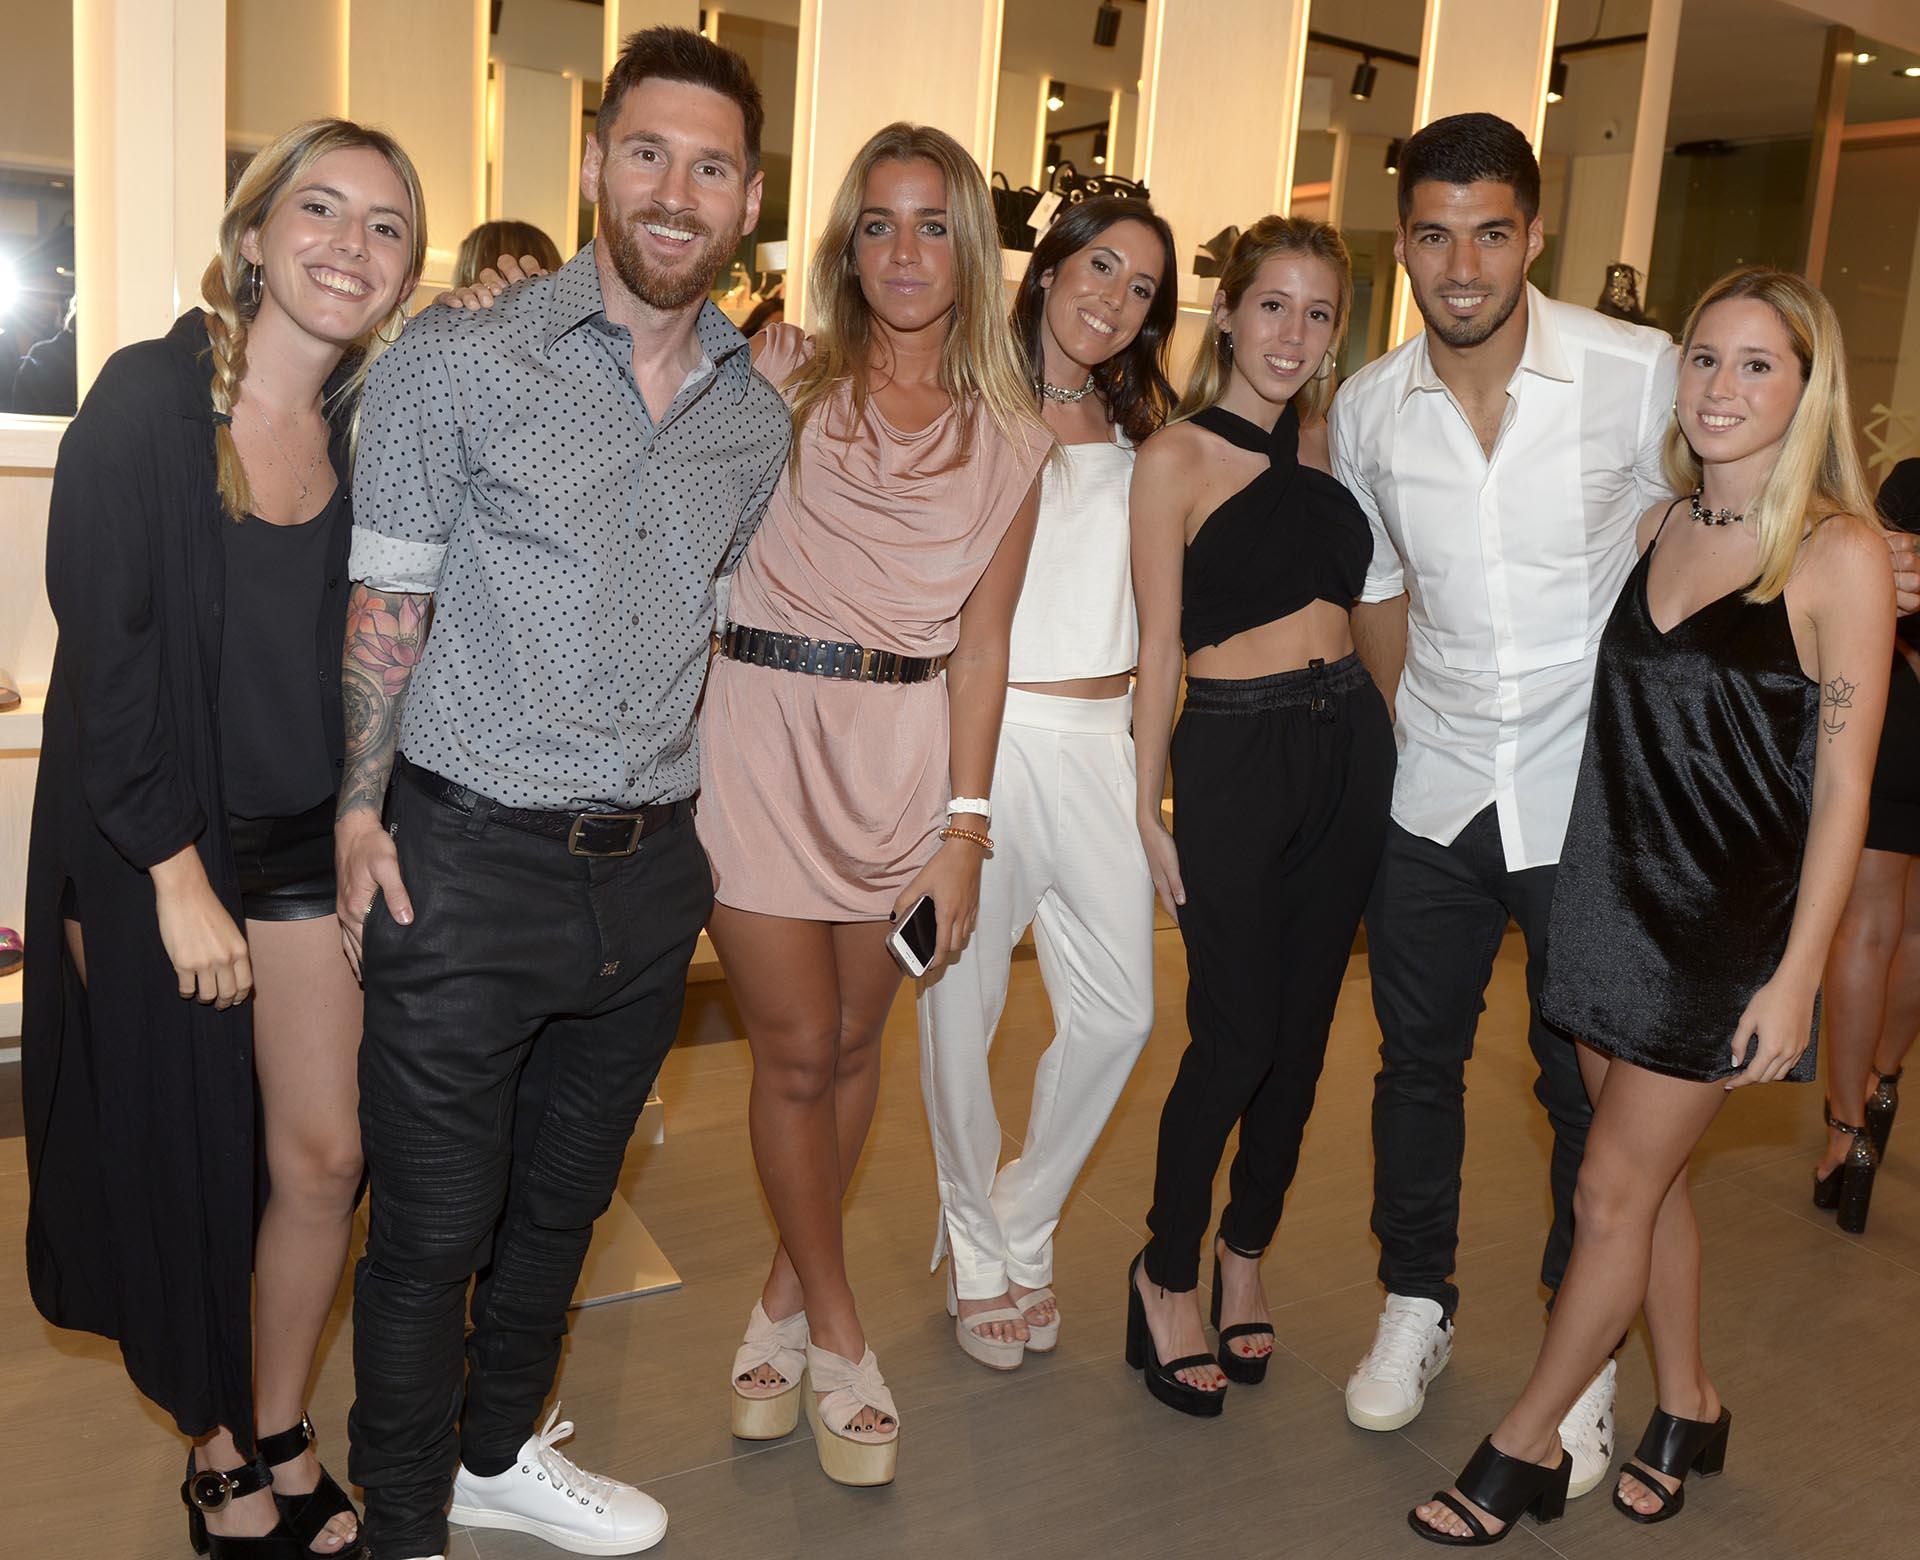 Josefina, Leo Messi, Julieta Scasso, Sofia, Clarita, Luis Suáerez y Violeta